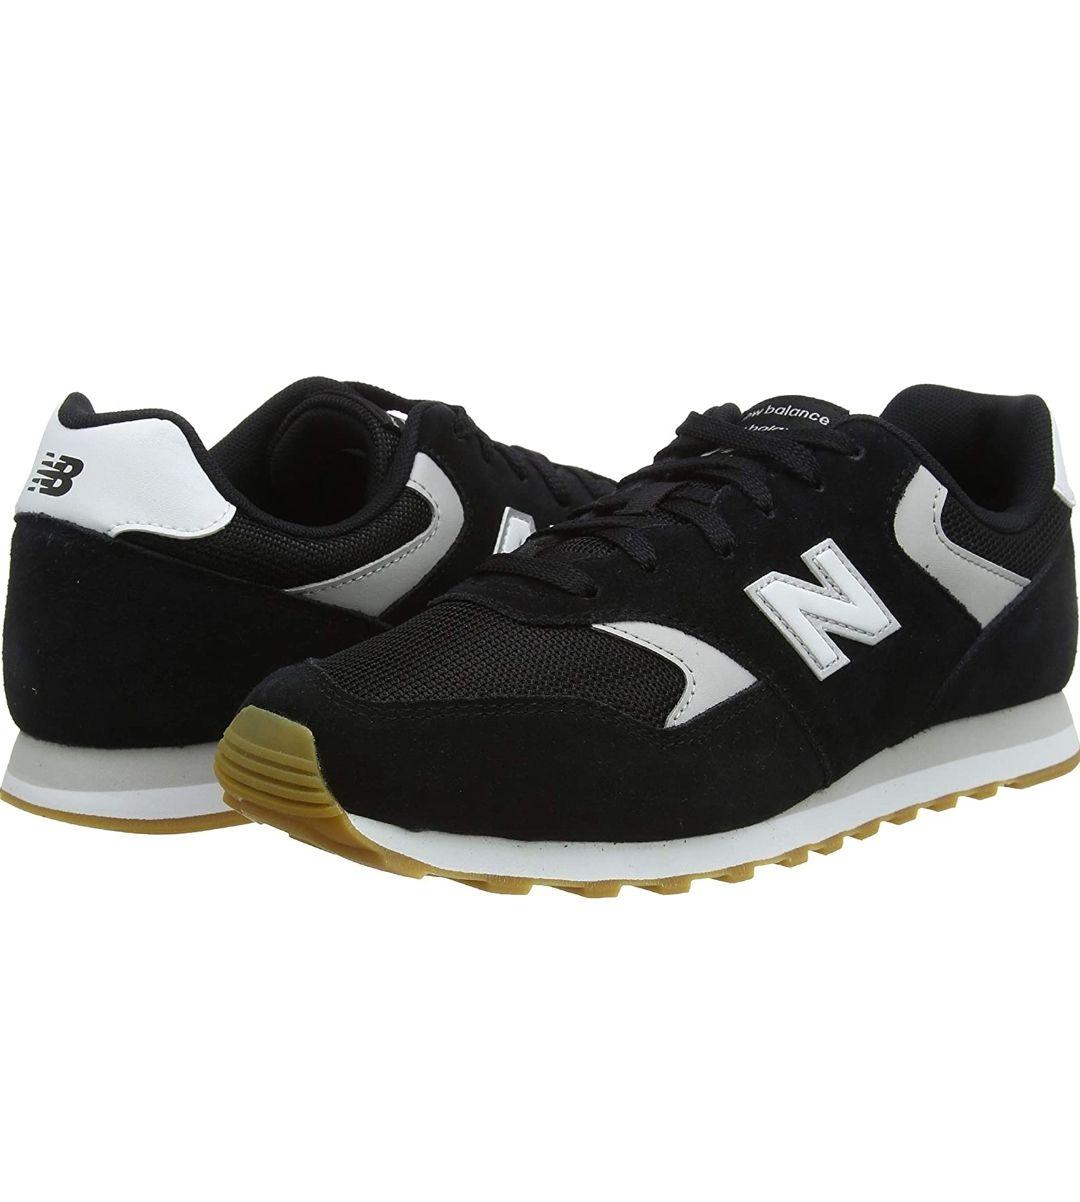 New Balance Men's 393 trainers - £28.94 @ Amazon